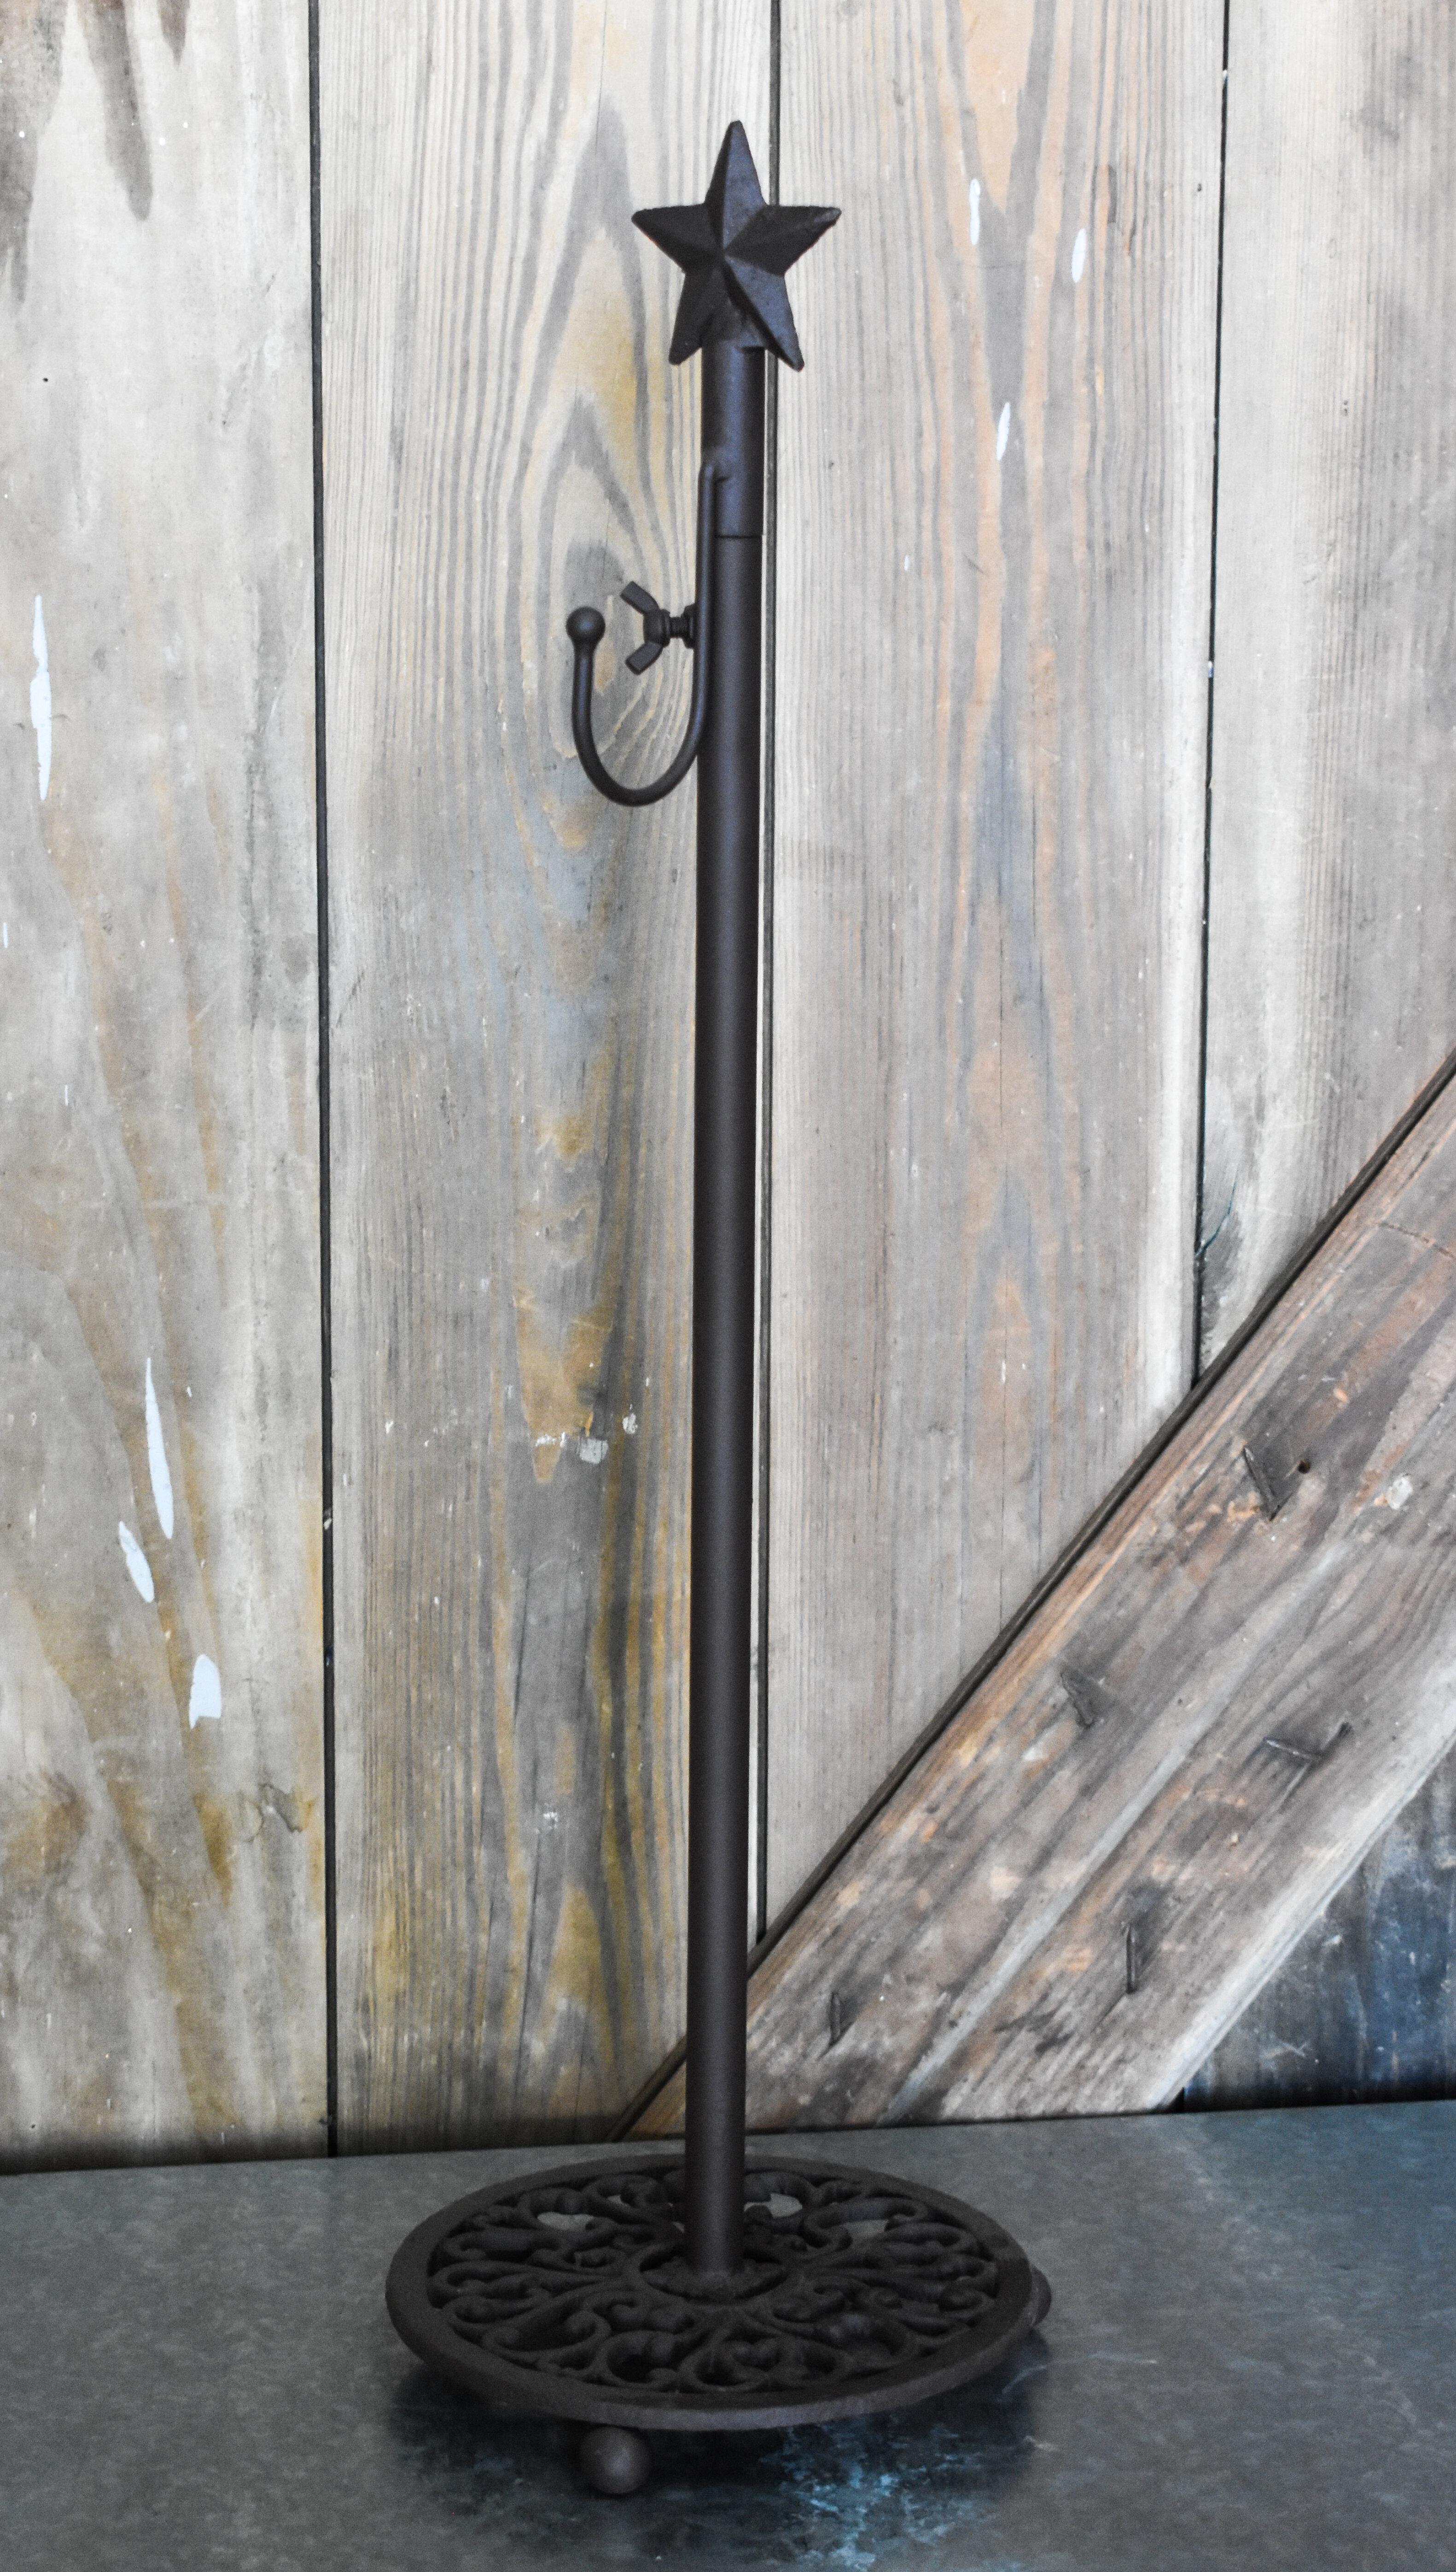 Attrayant Charlton Home Adjustable Wreath Stand | Wayfair